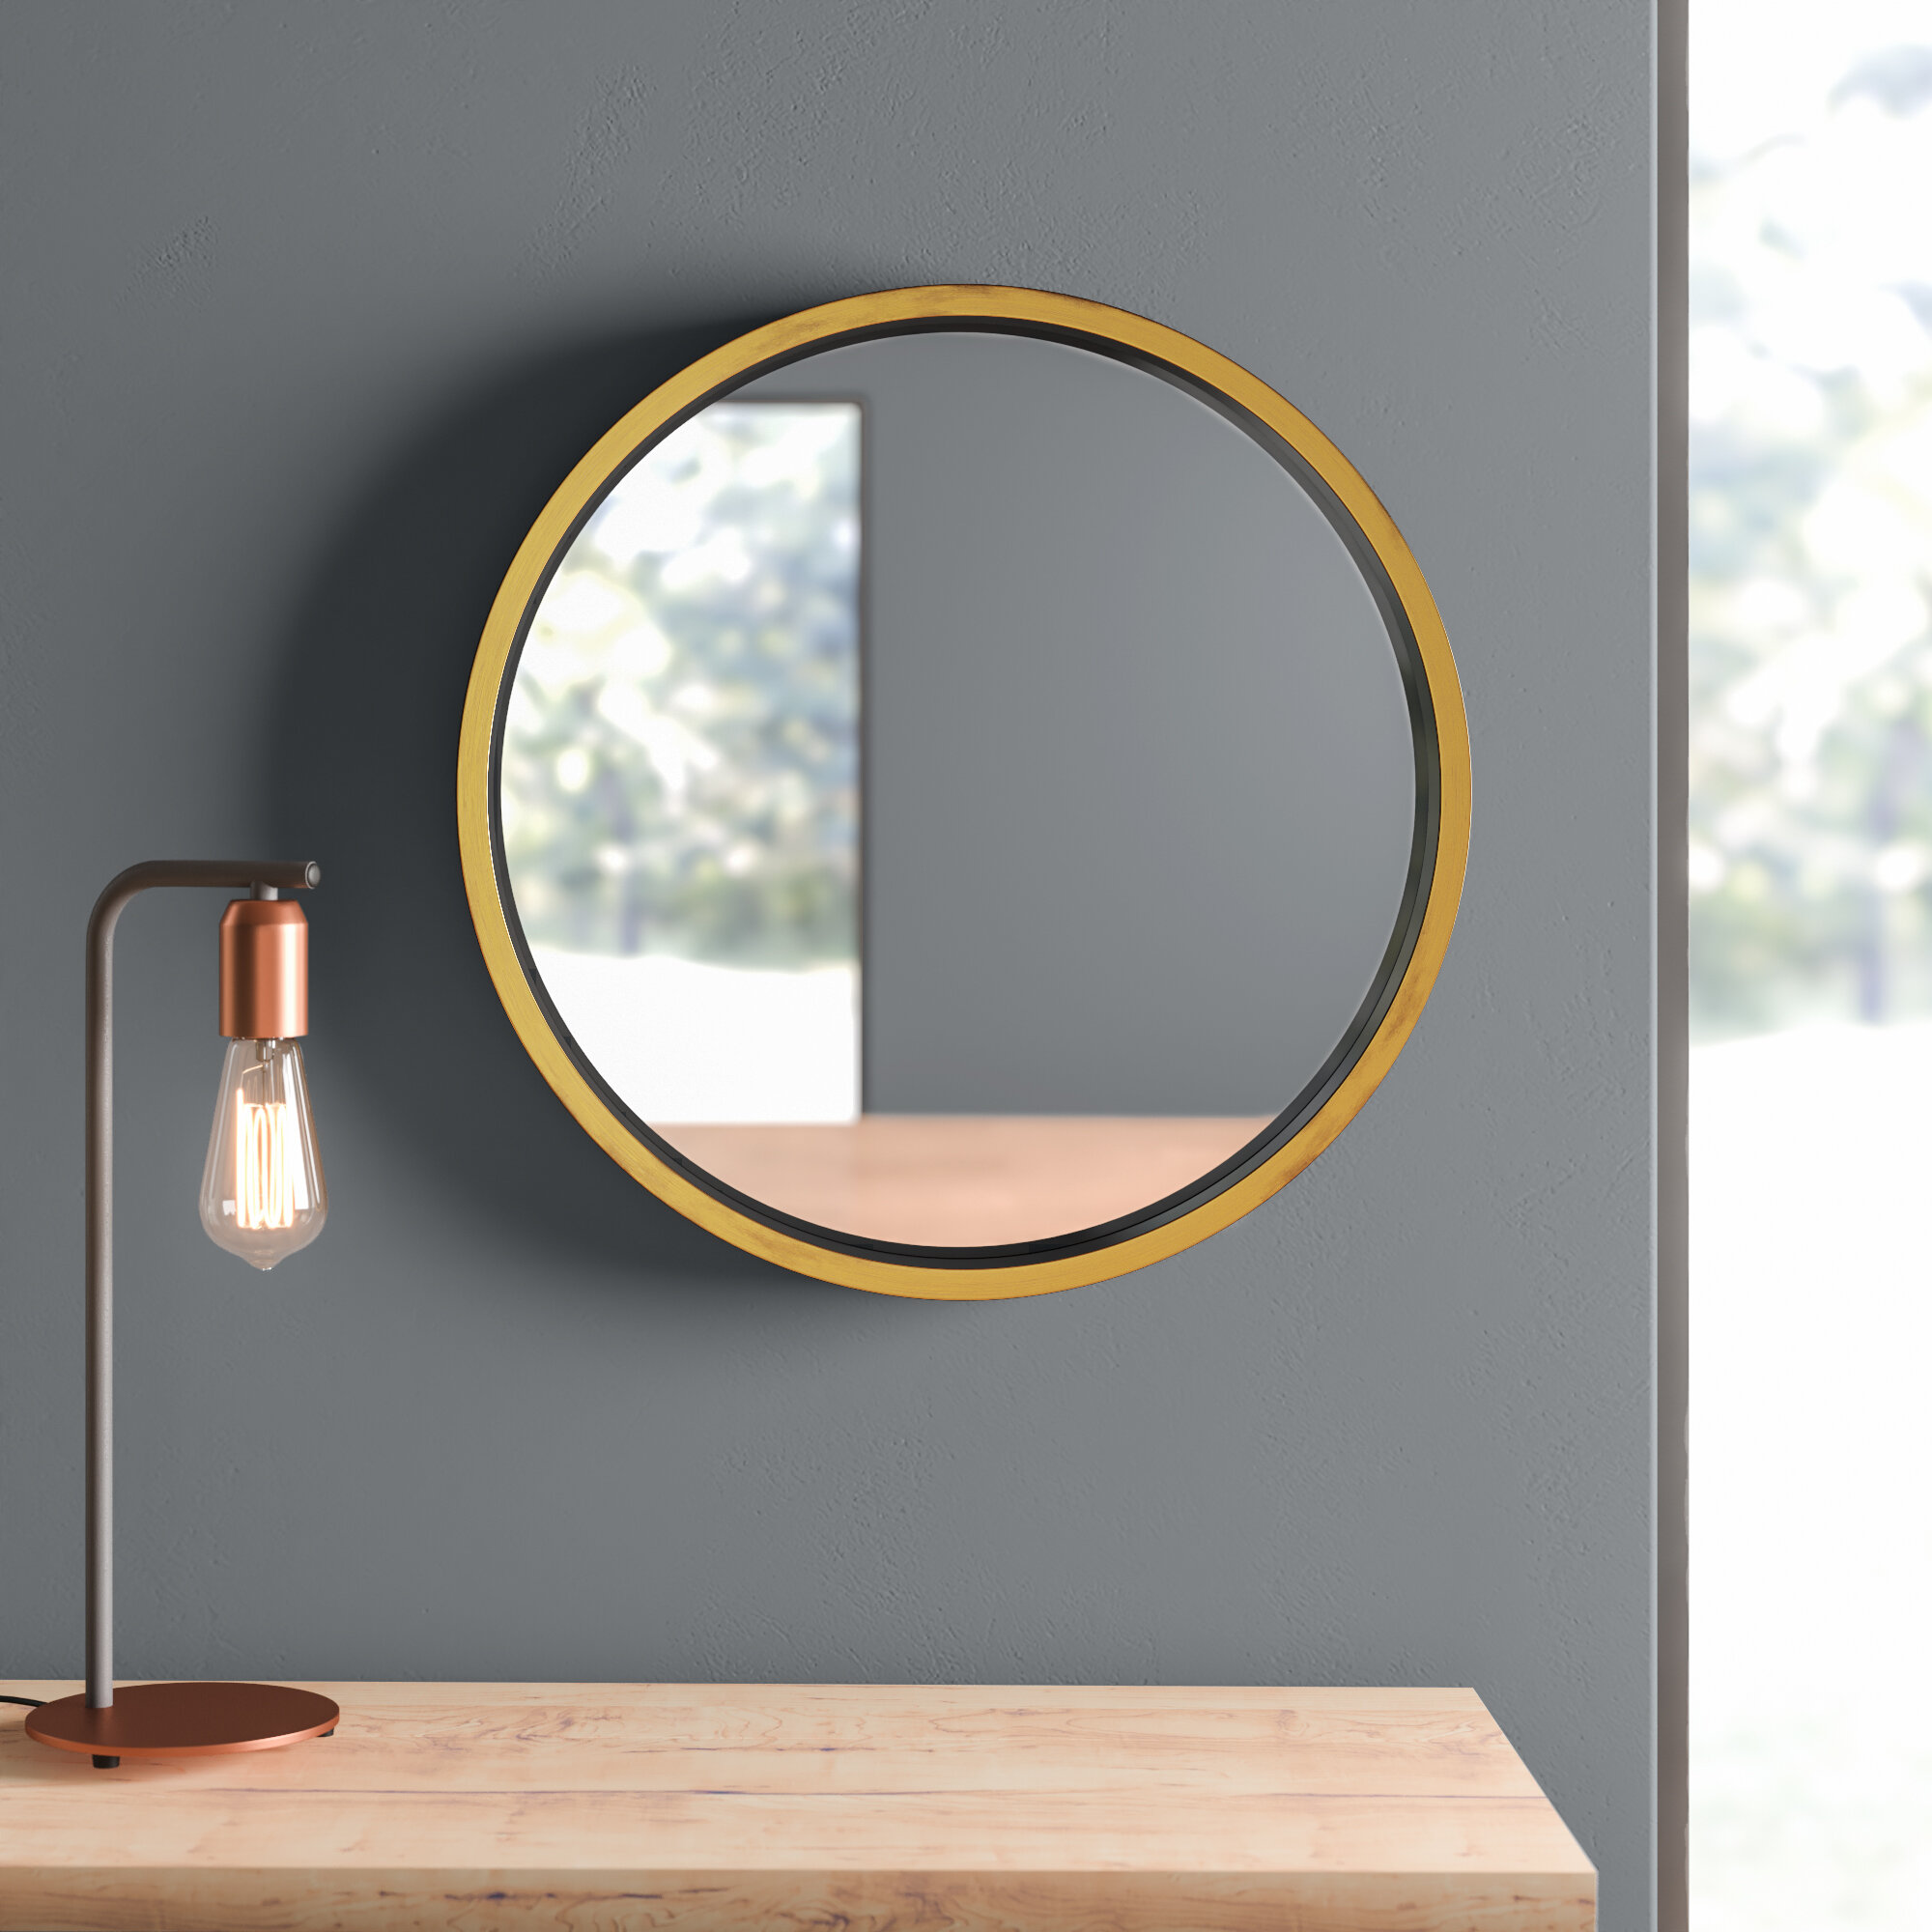 Houten Modern Contemporary Bathroom Vanity Mirror Reviews Allmodern